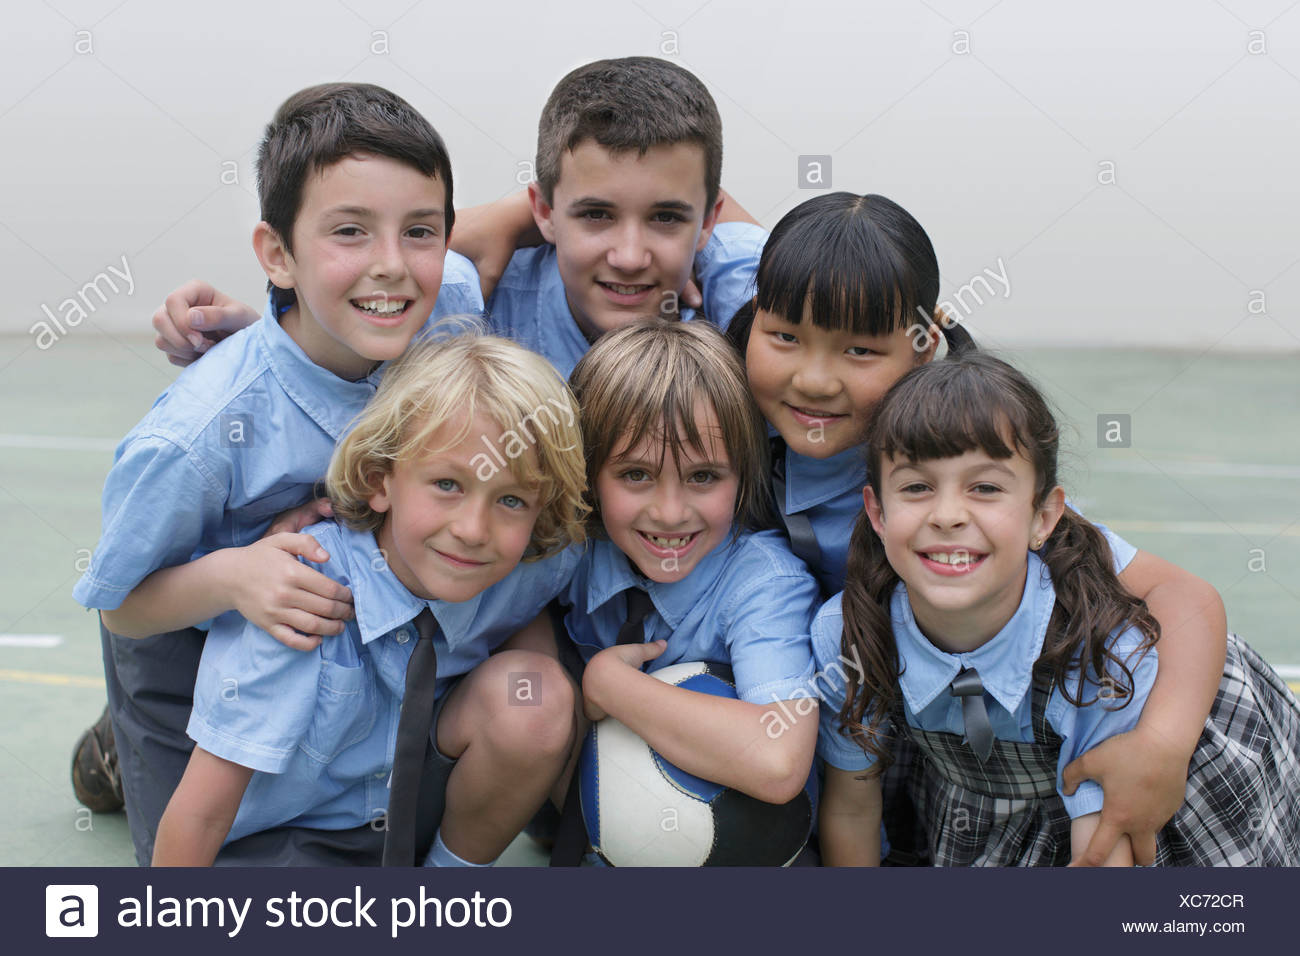 School children in group photo - Stock Image